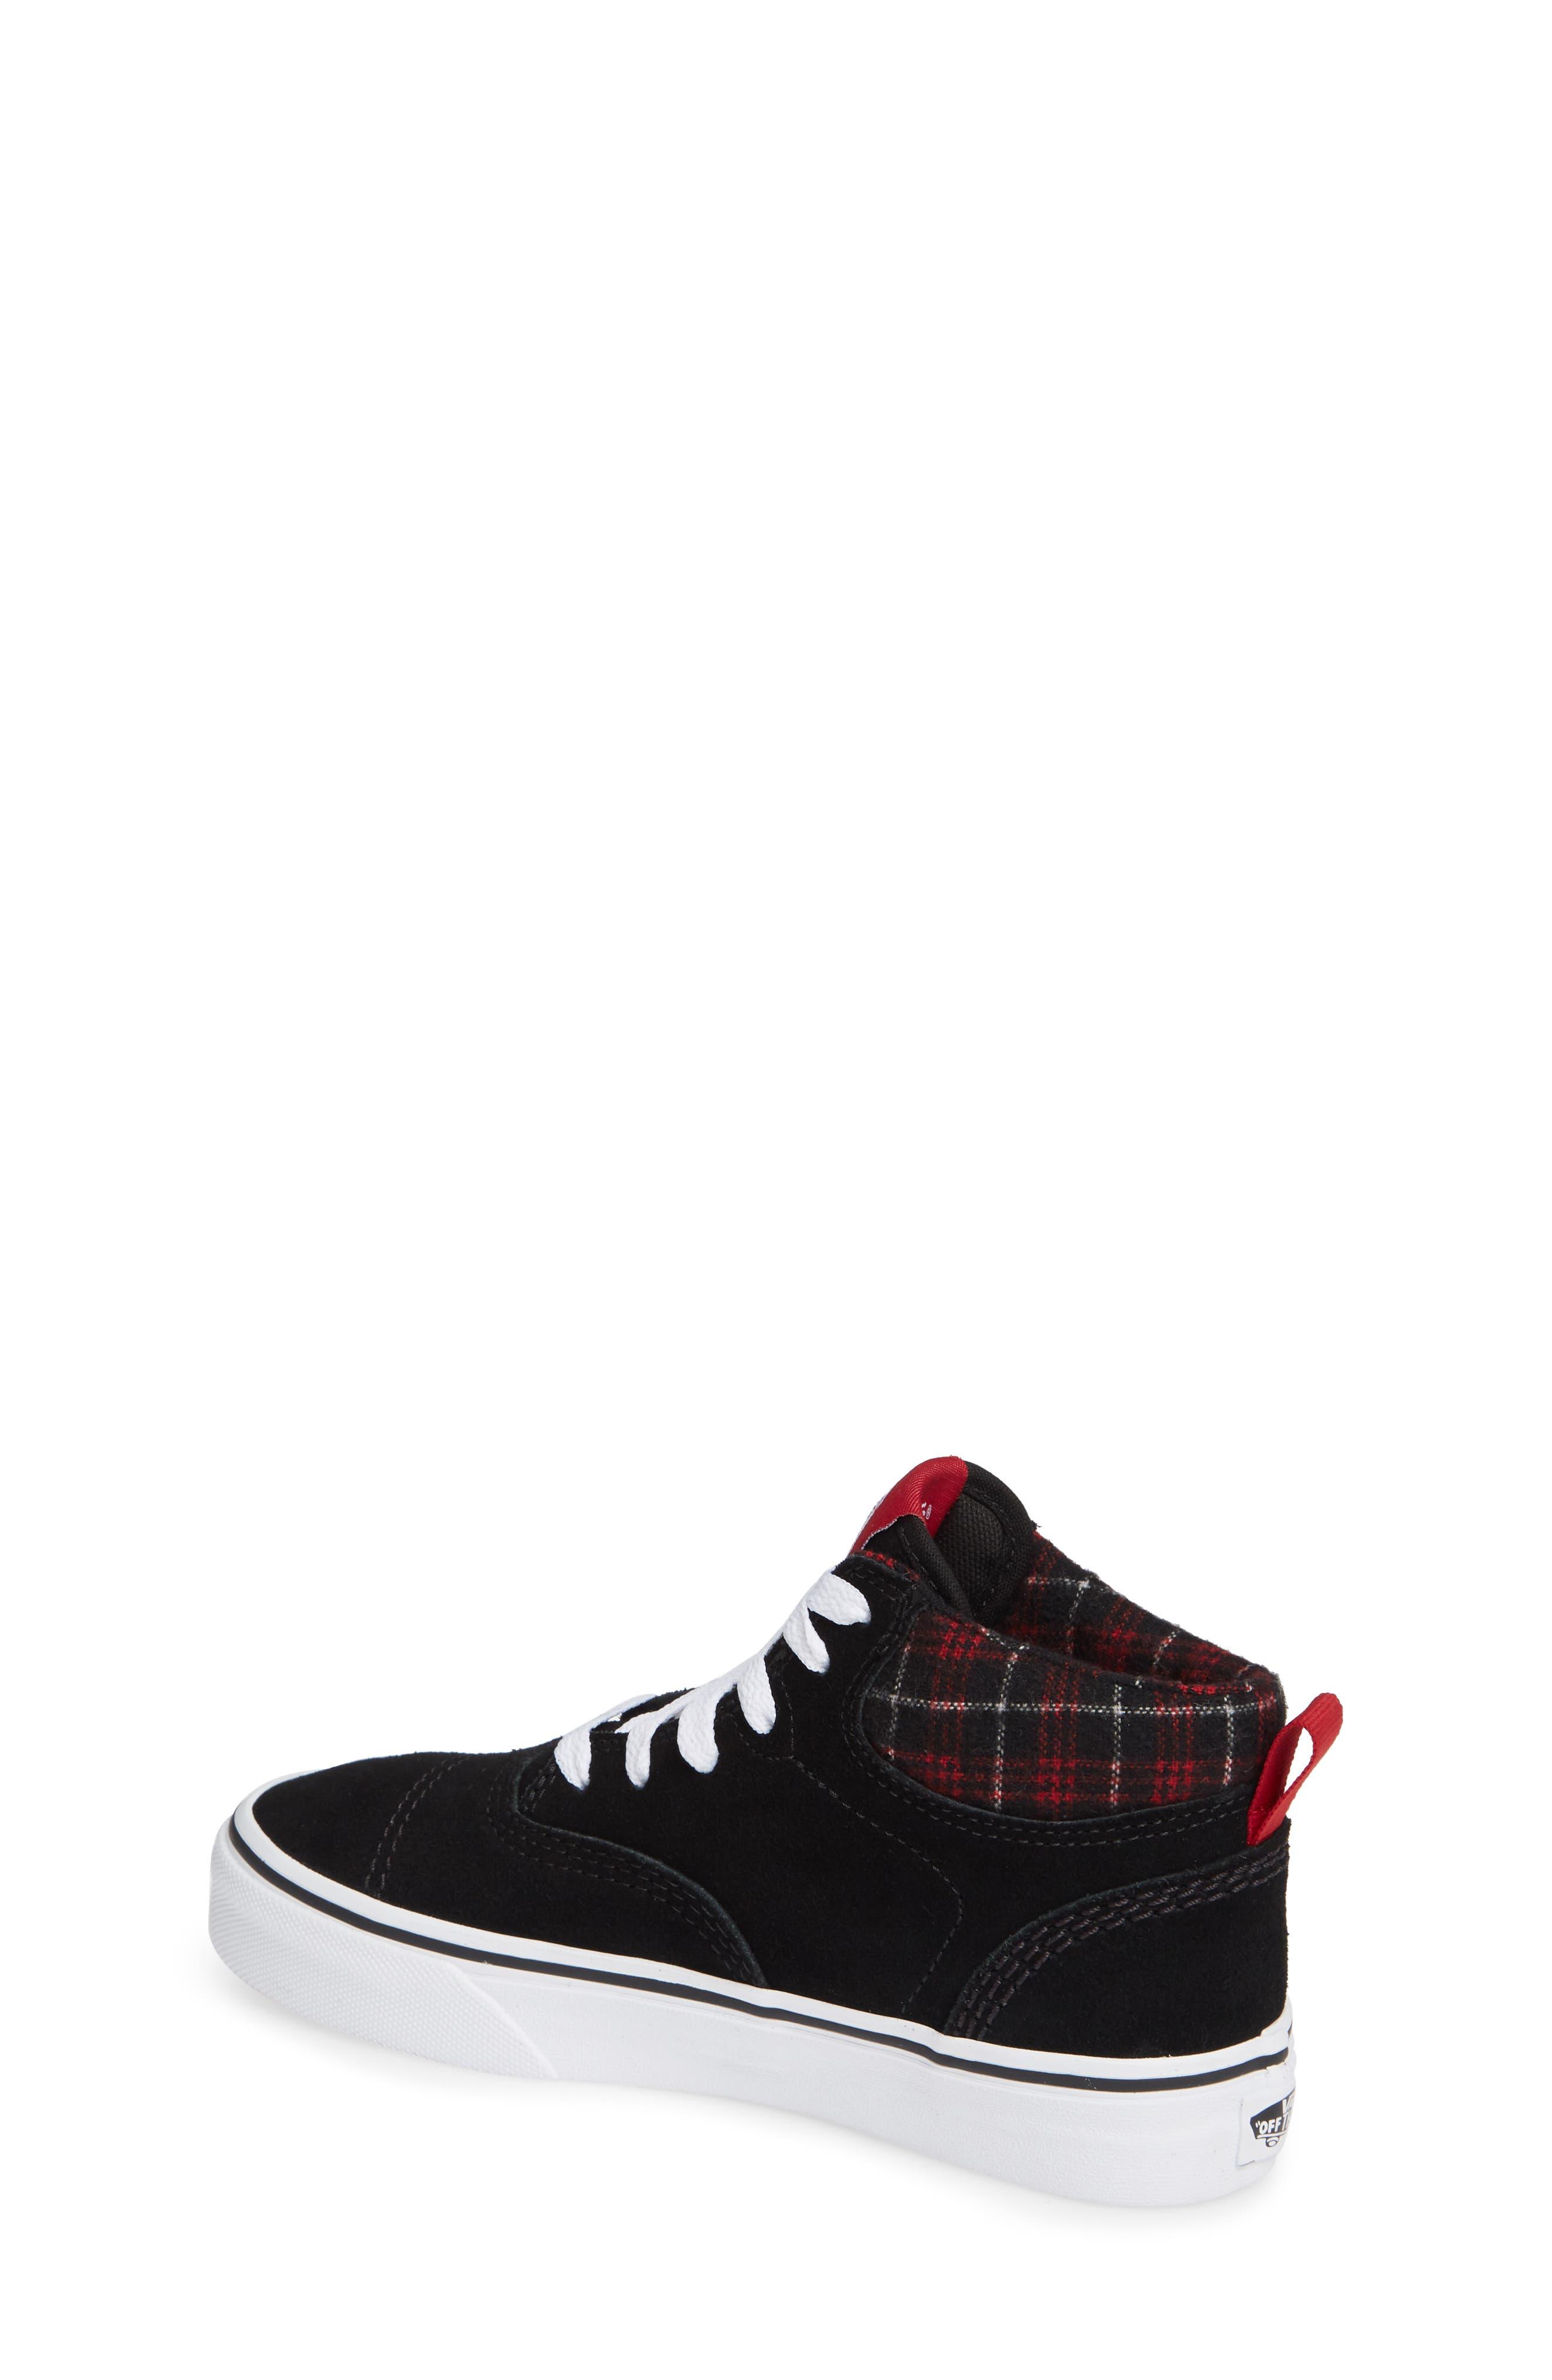 Era - Hi Sneaker,                             Alternate thumbnail 2, color,                             SUEDE AND PLAID BLACK/ WHITE